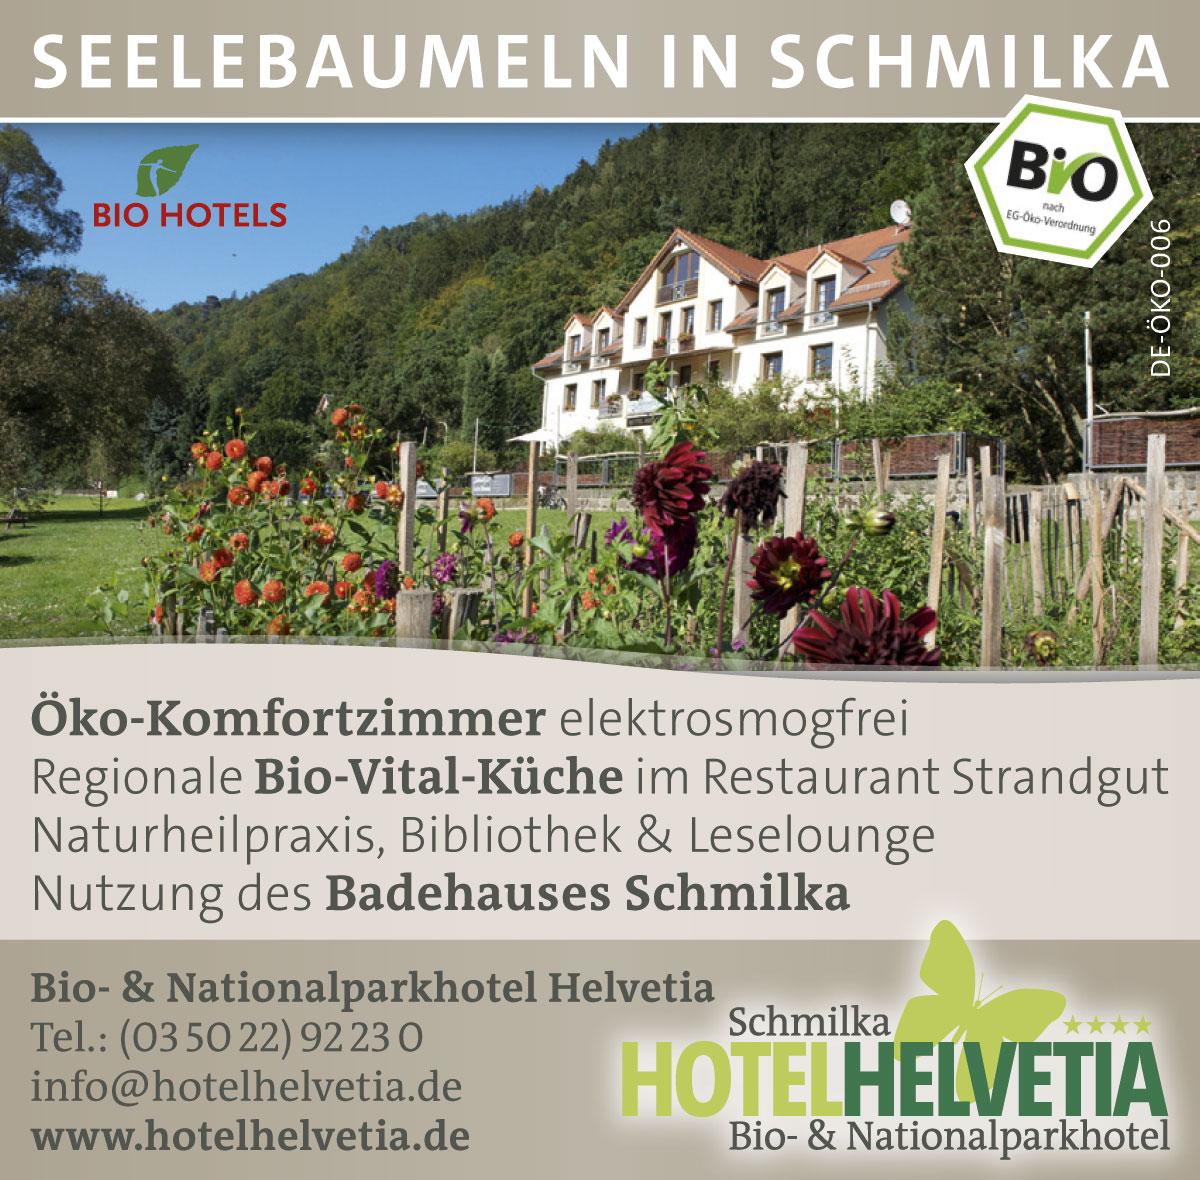 Anzeige Hotel Helvetia